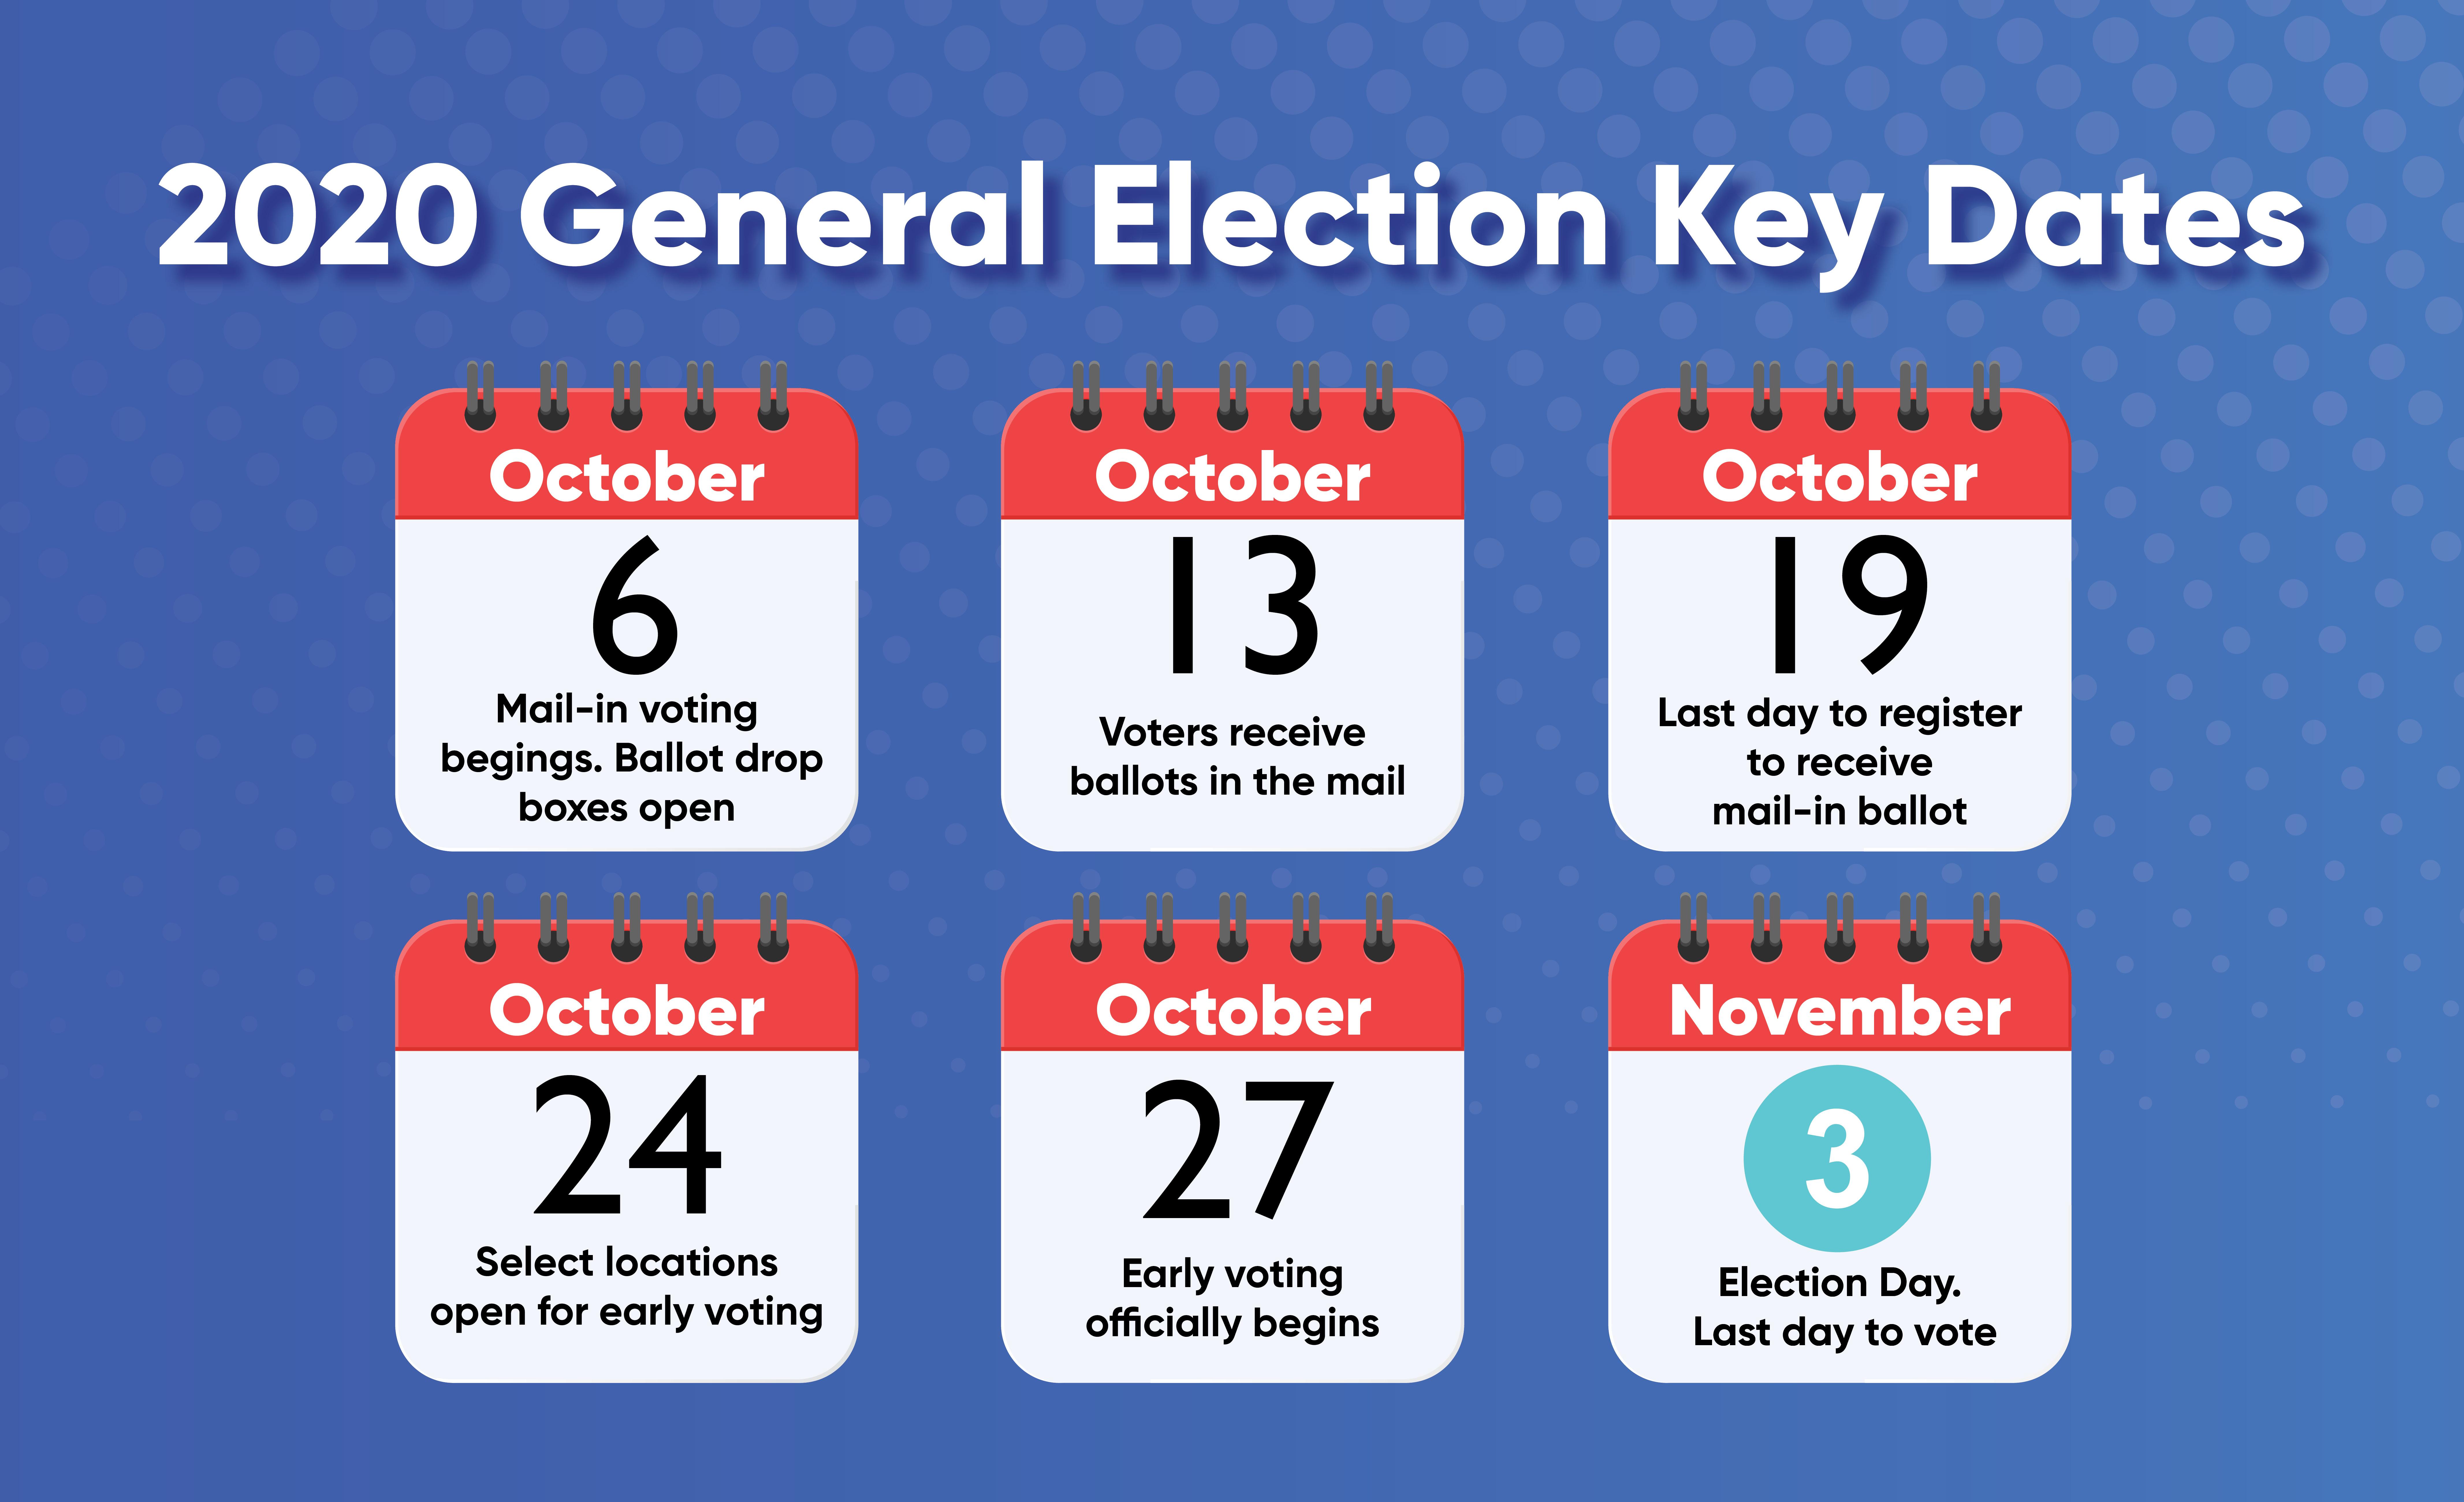 General Election Key Dates